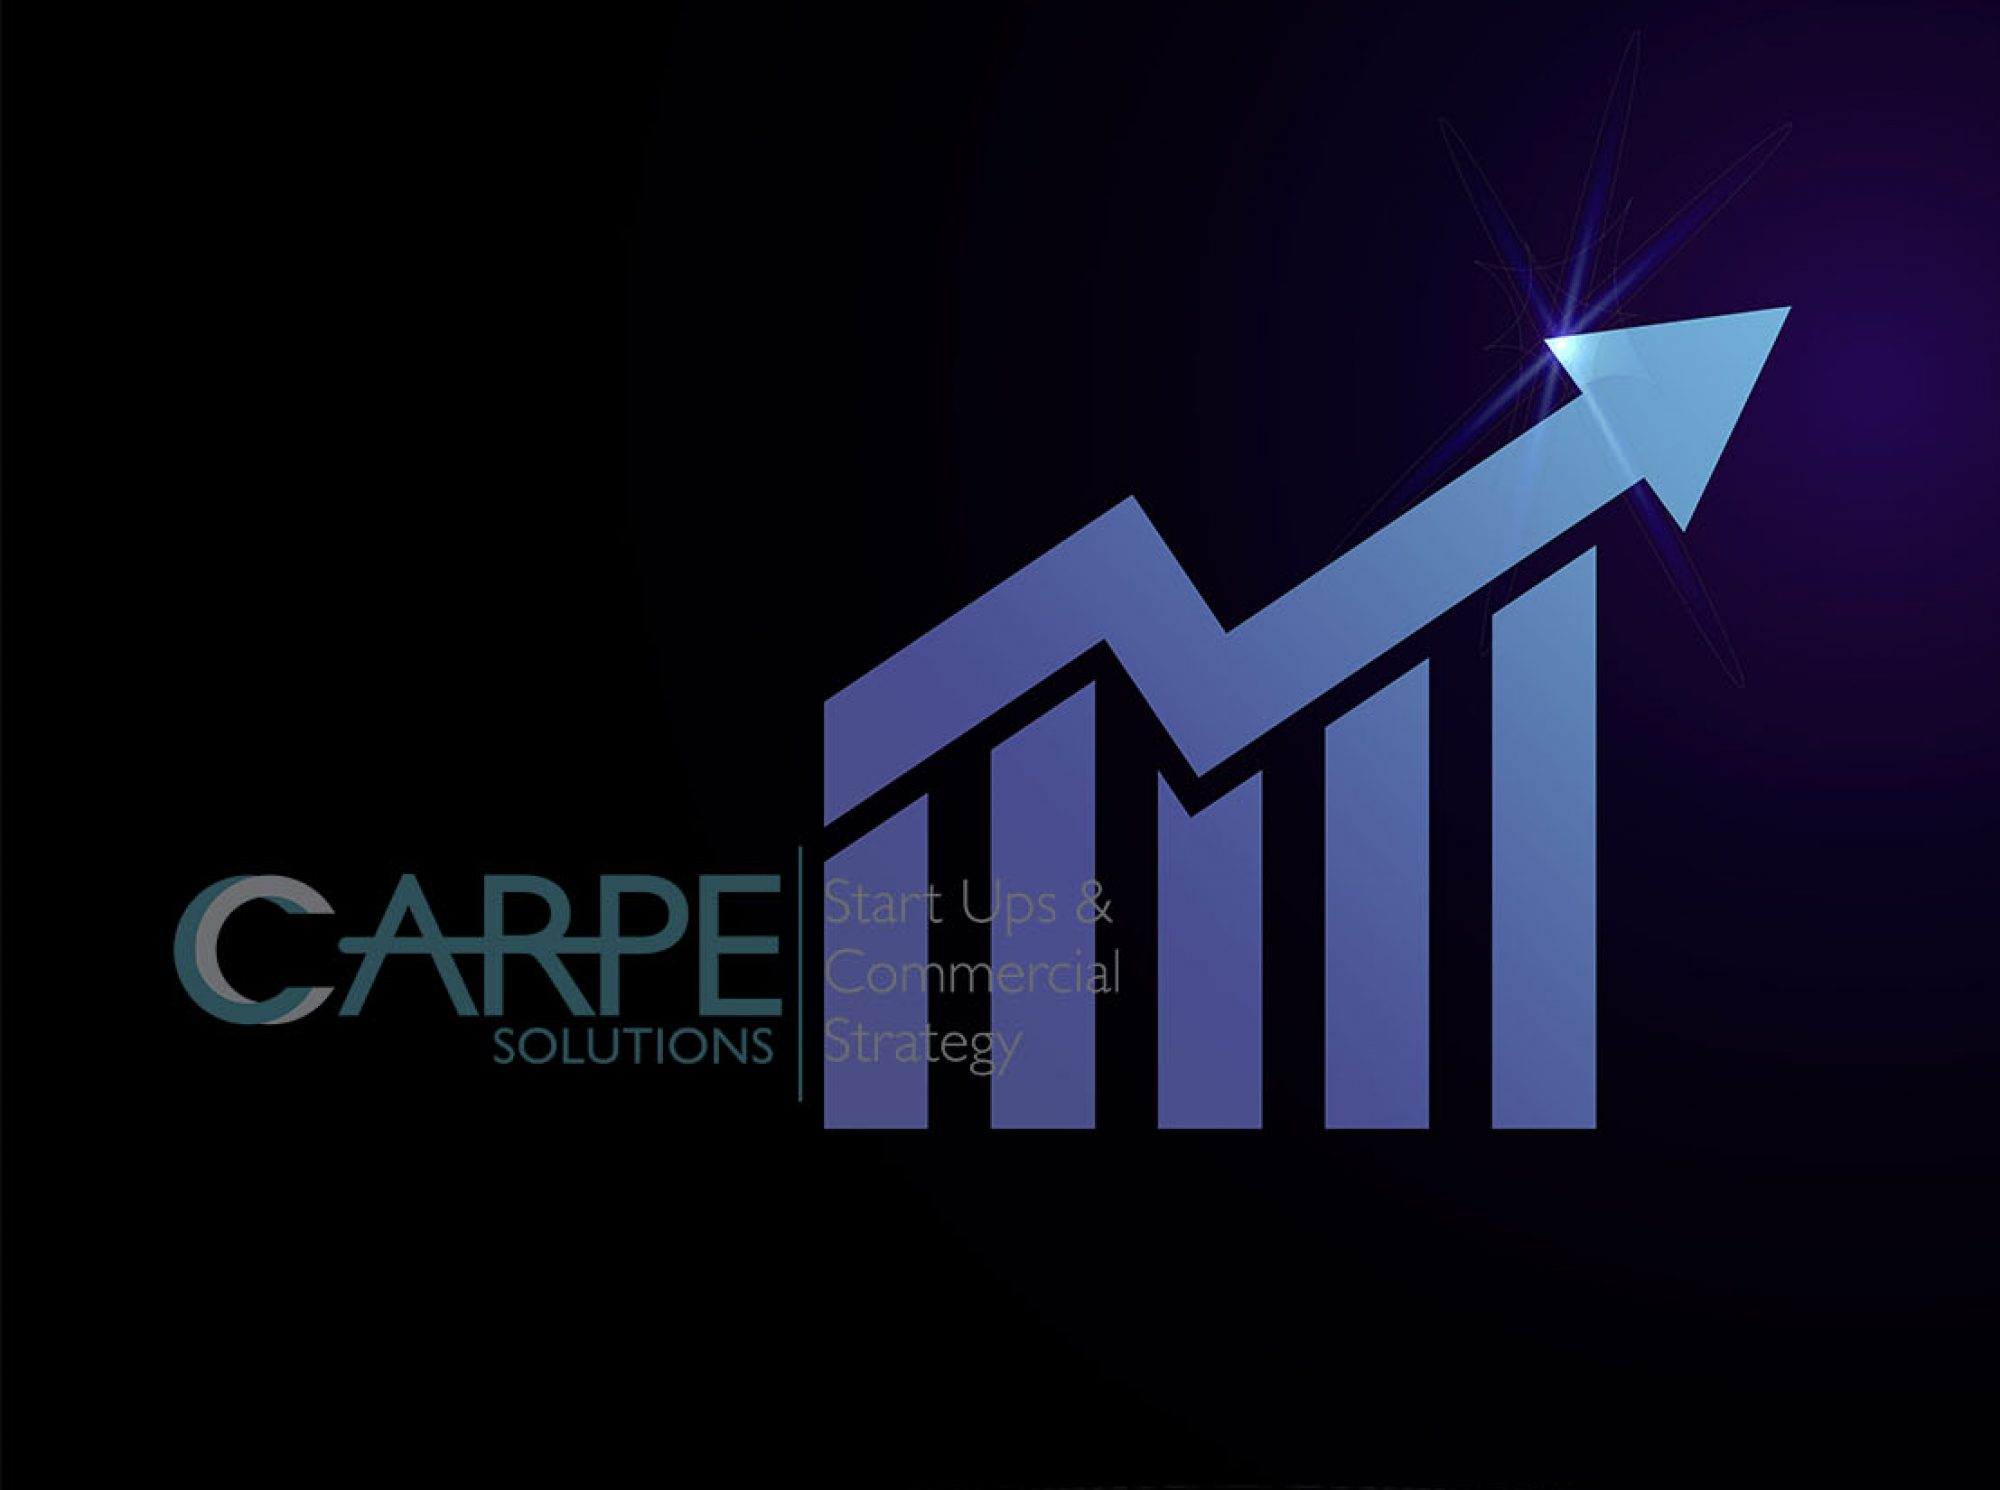 CCARPE